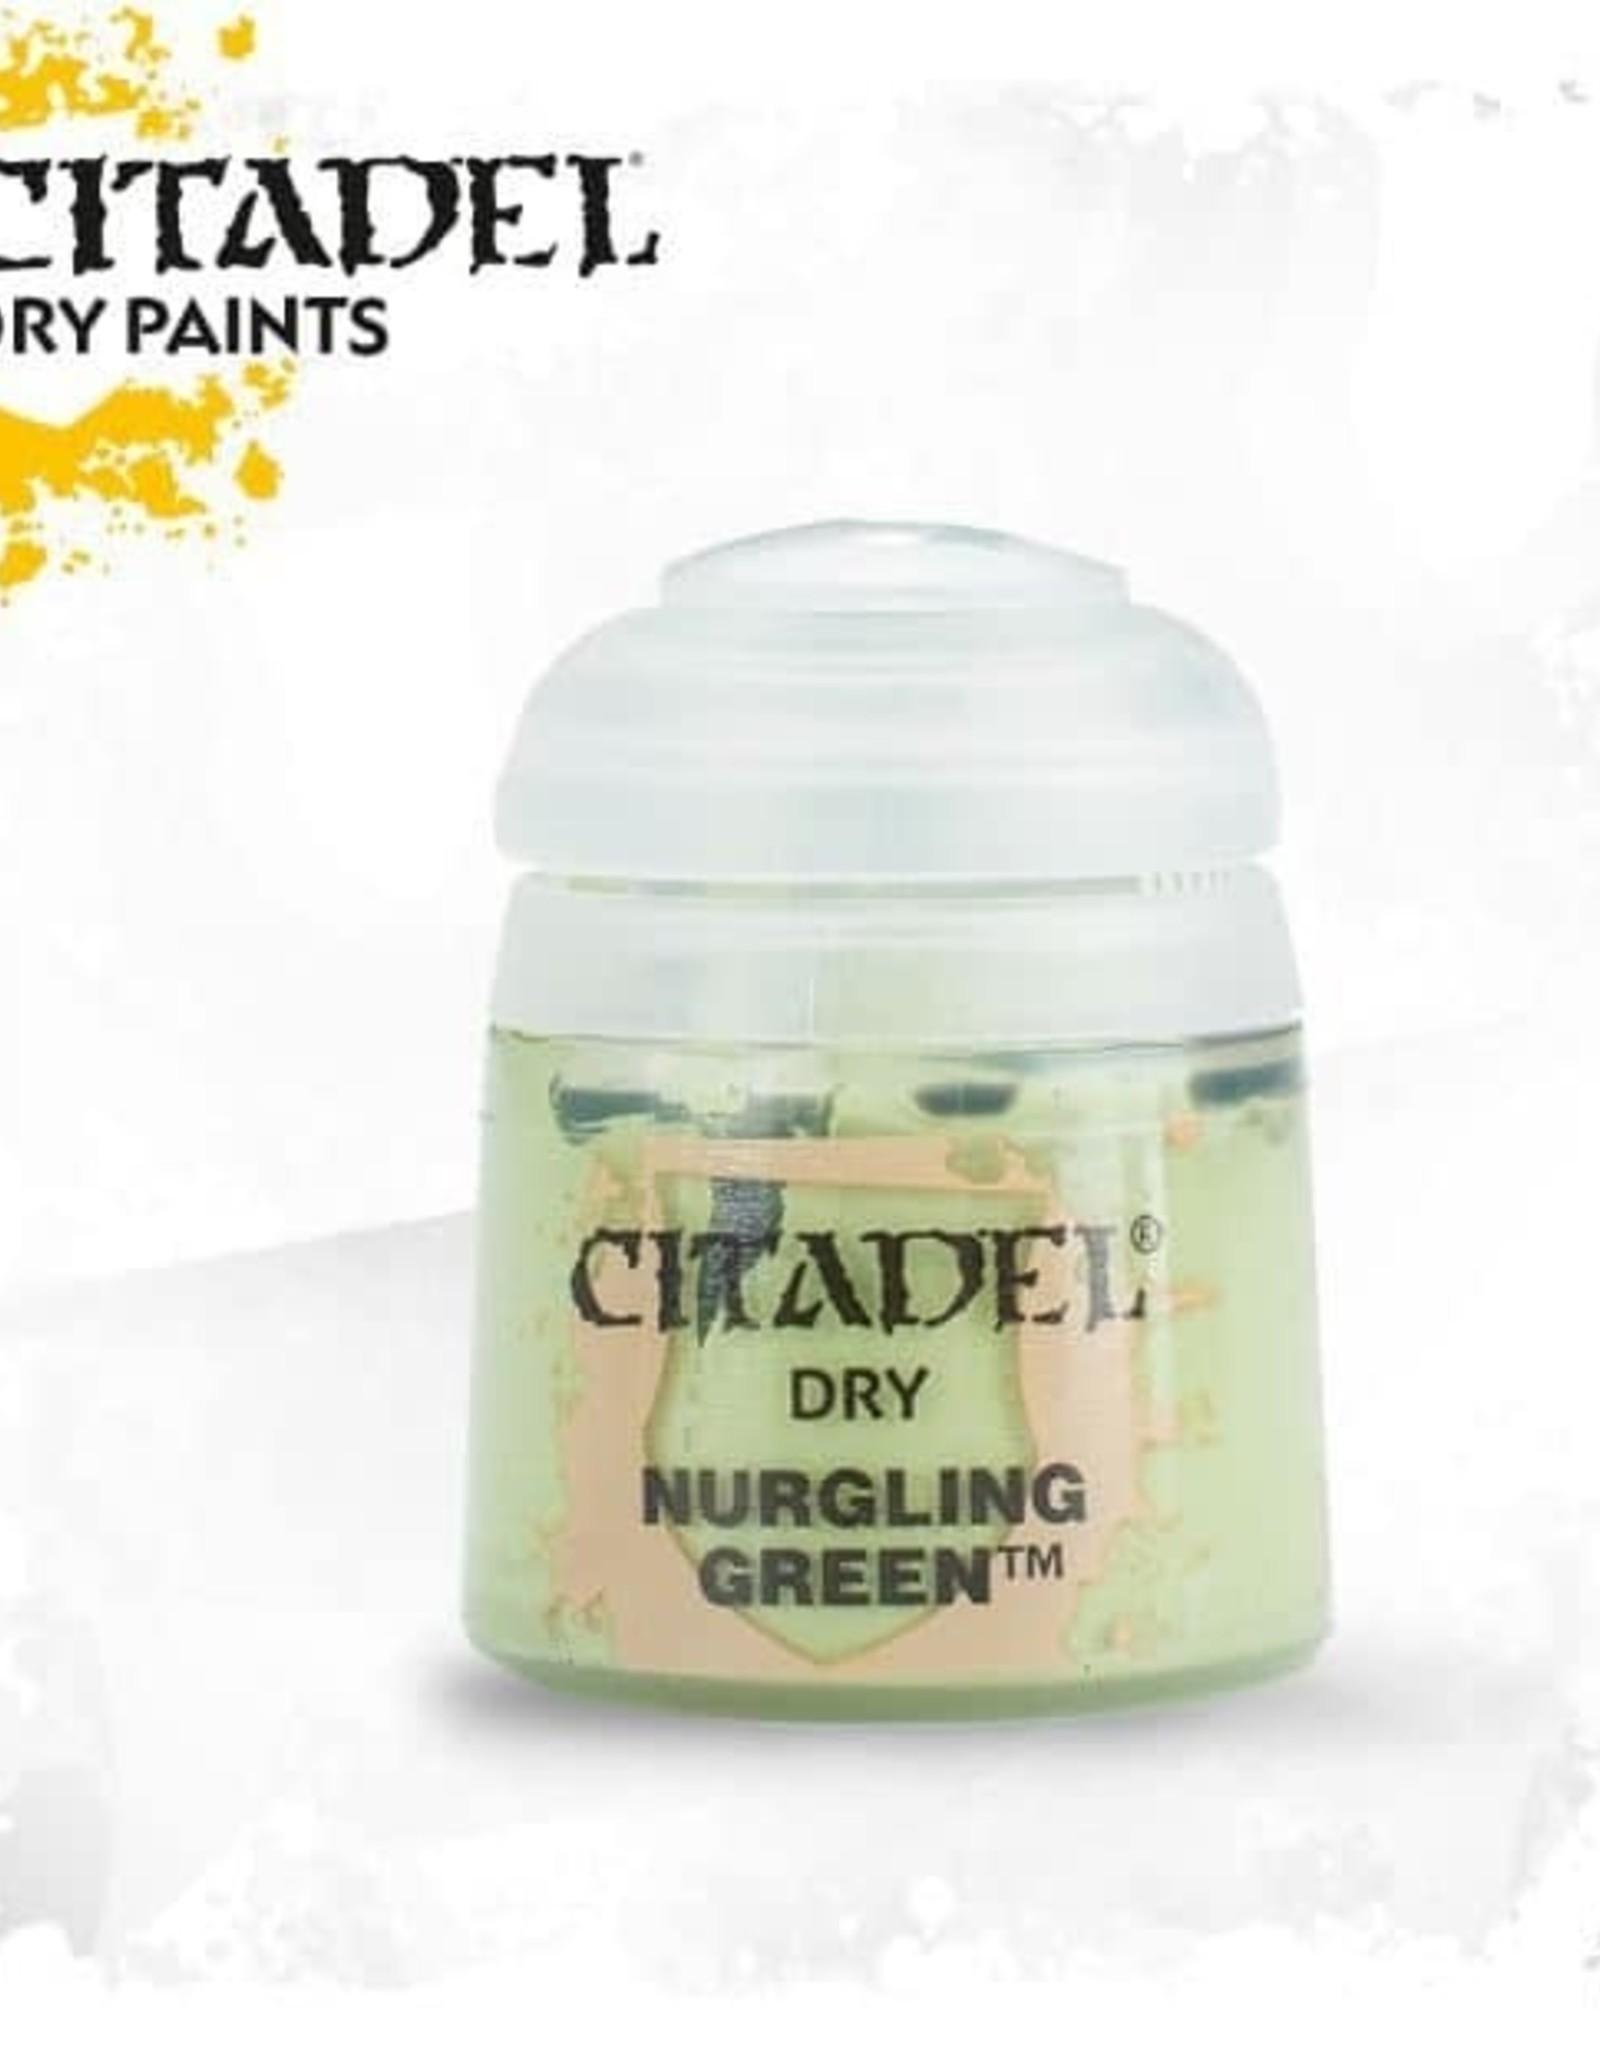 Games Workshop Citadel Paint: Dry - Nurgling Green